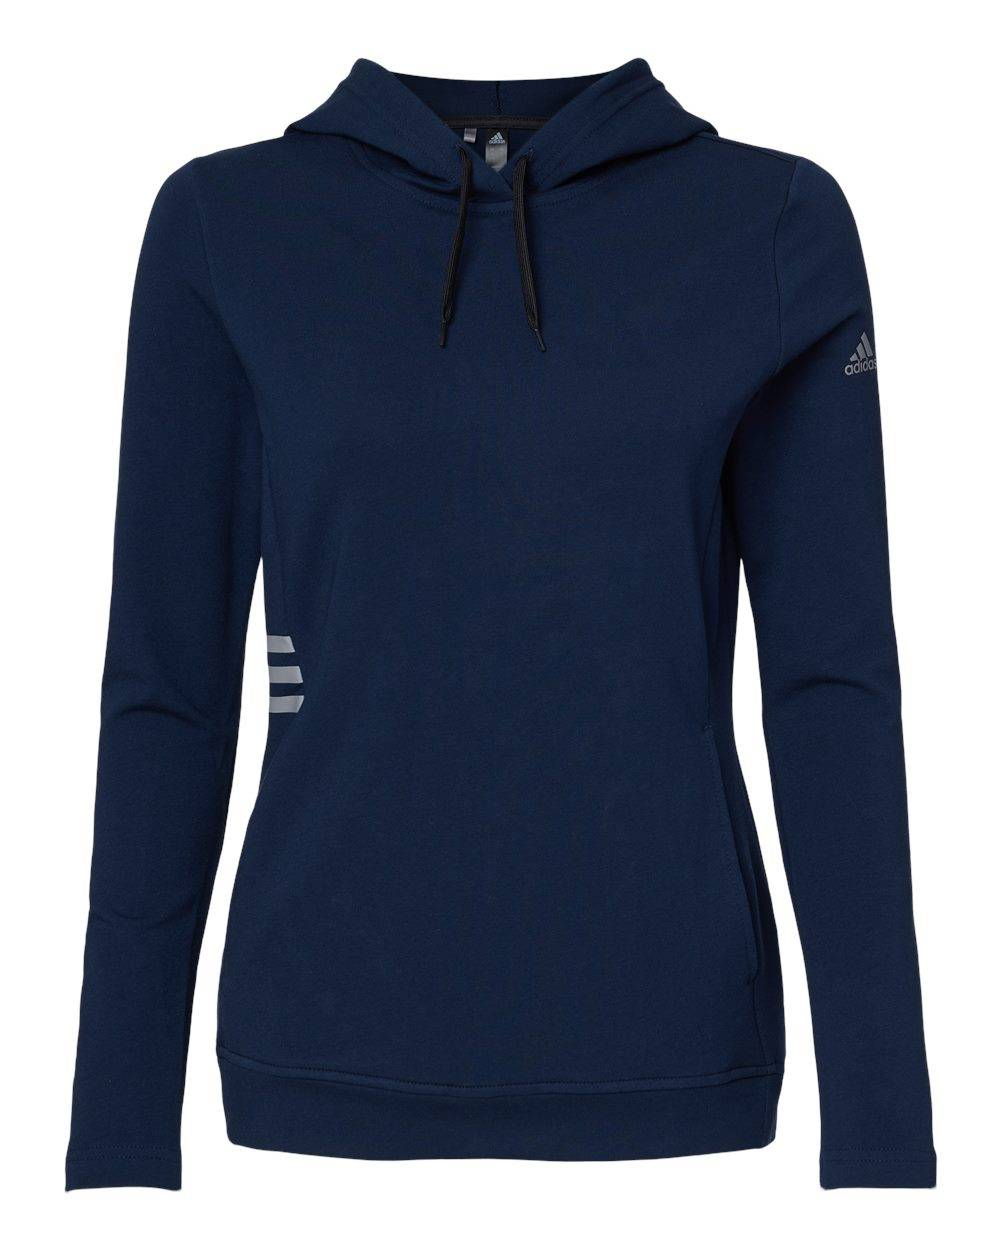 Adidas - Women's Lightweight Hooded Sweatshirt - A451 - Collegiate Navy - 3X-Large